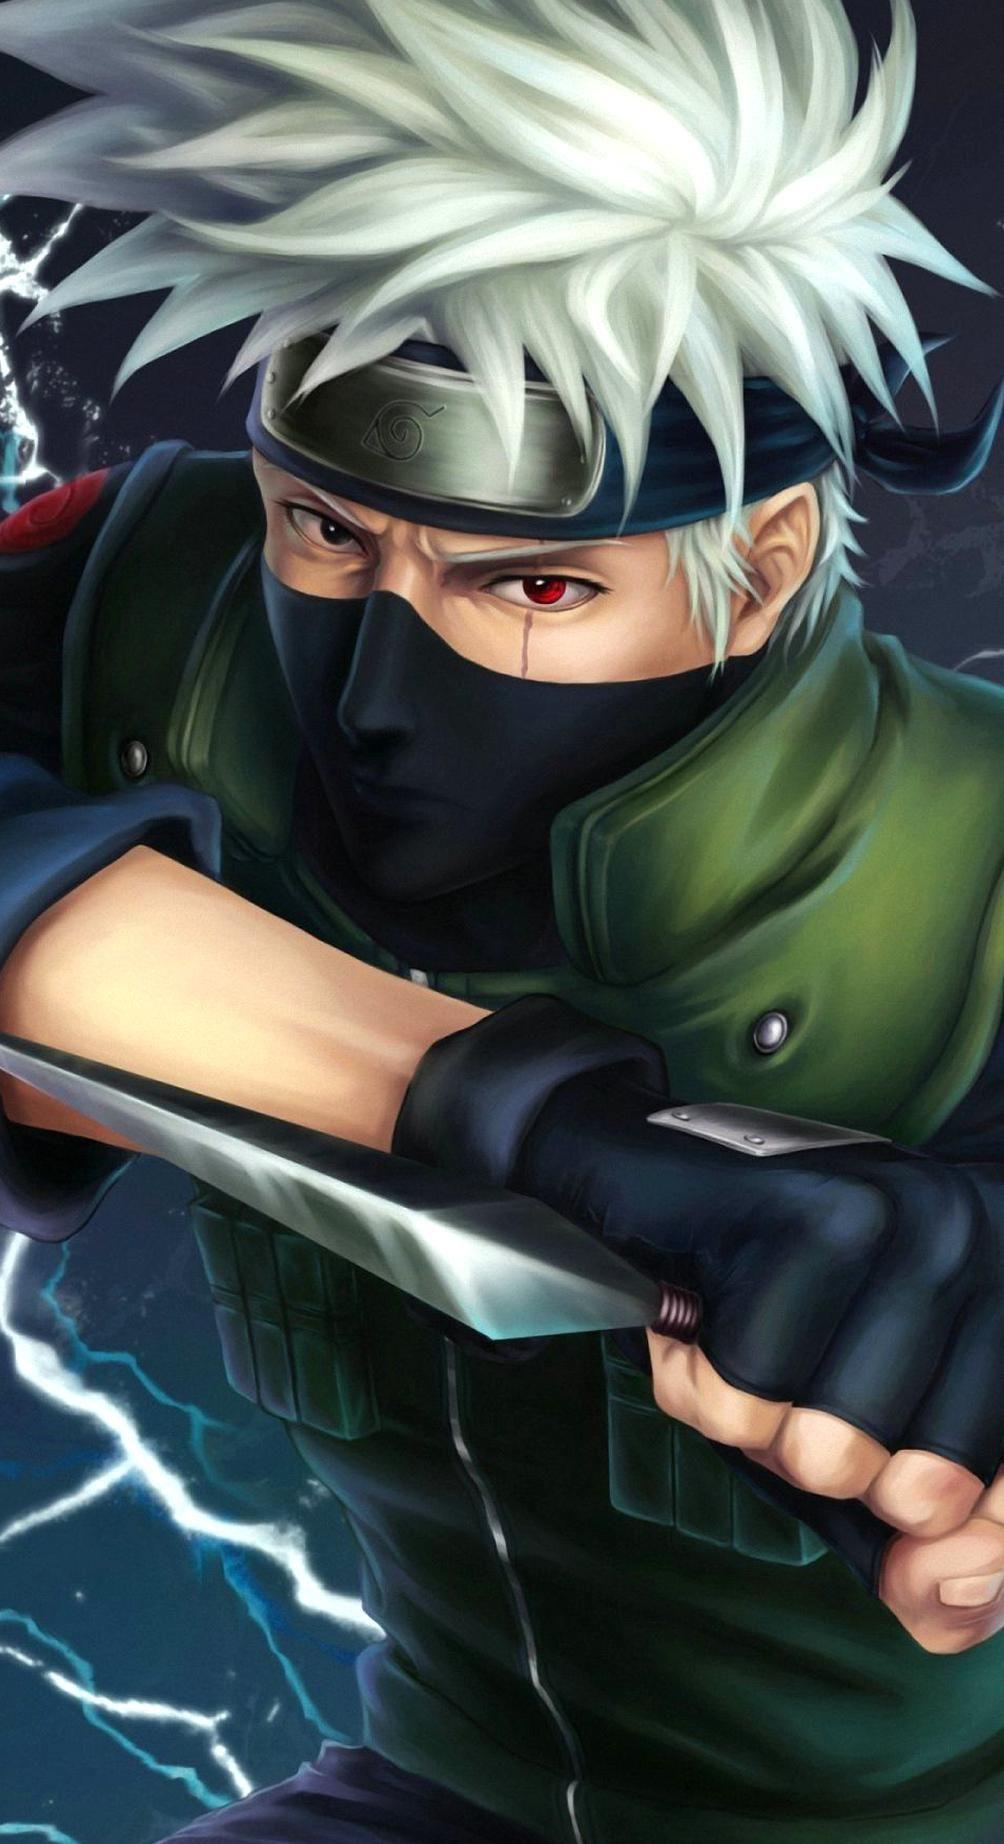 Wallpaper Naruto Shippuden 5 Weve gathered more than 3